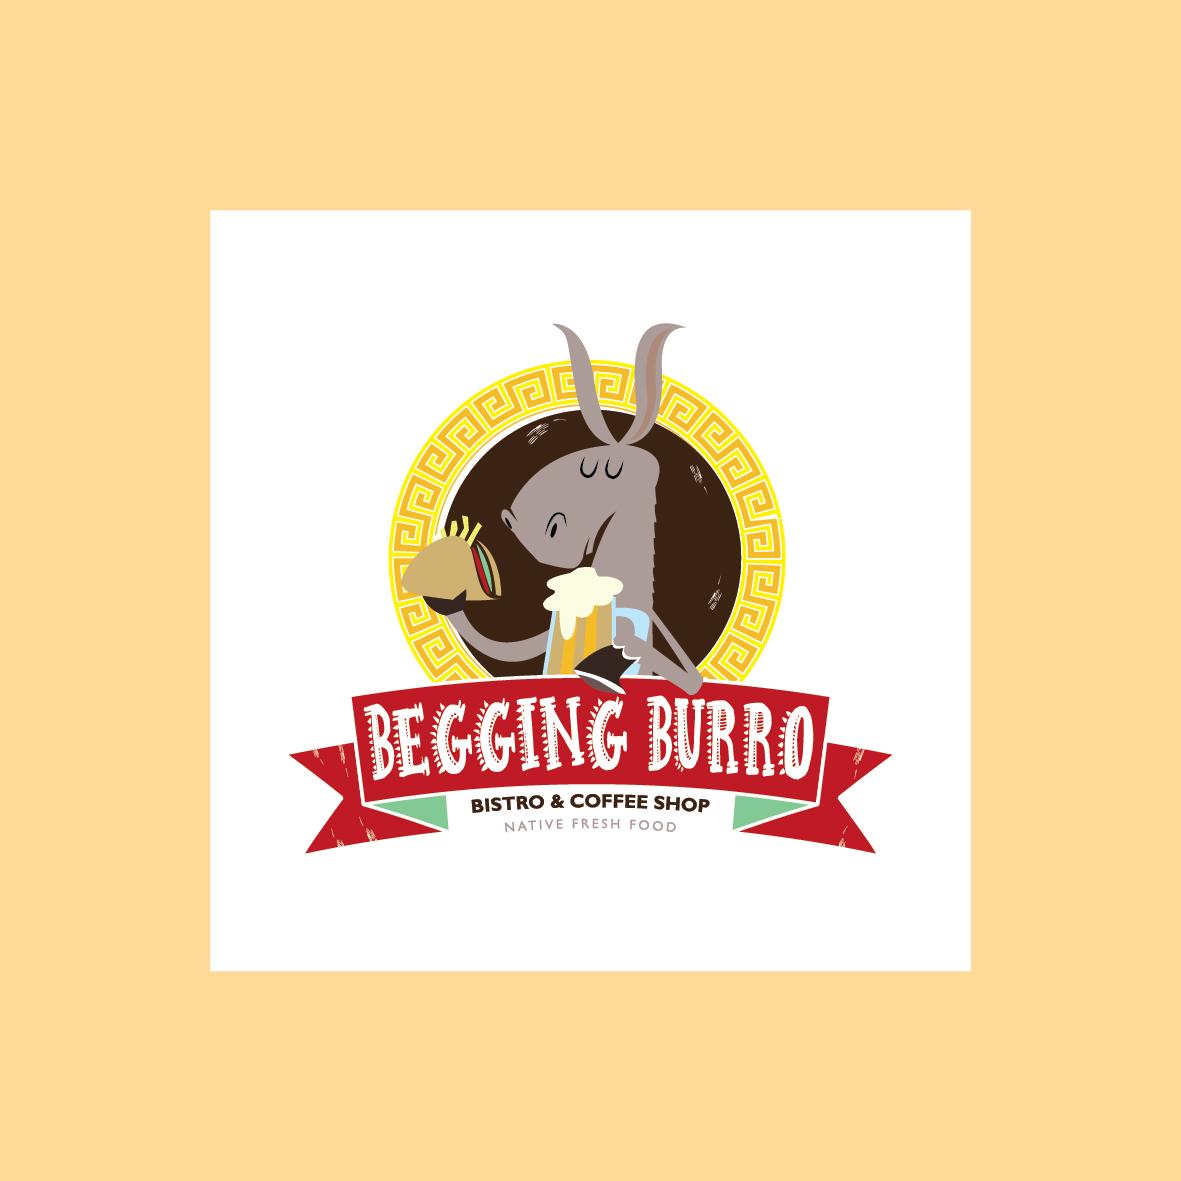 Beggng Burro Logo